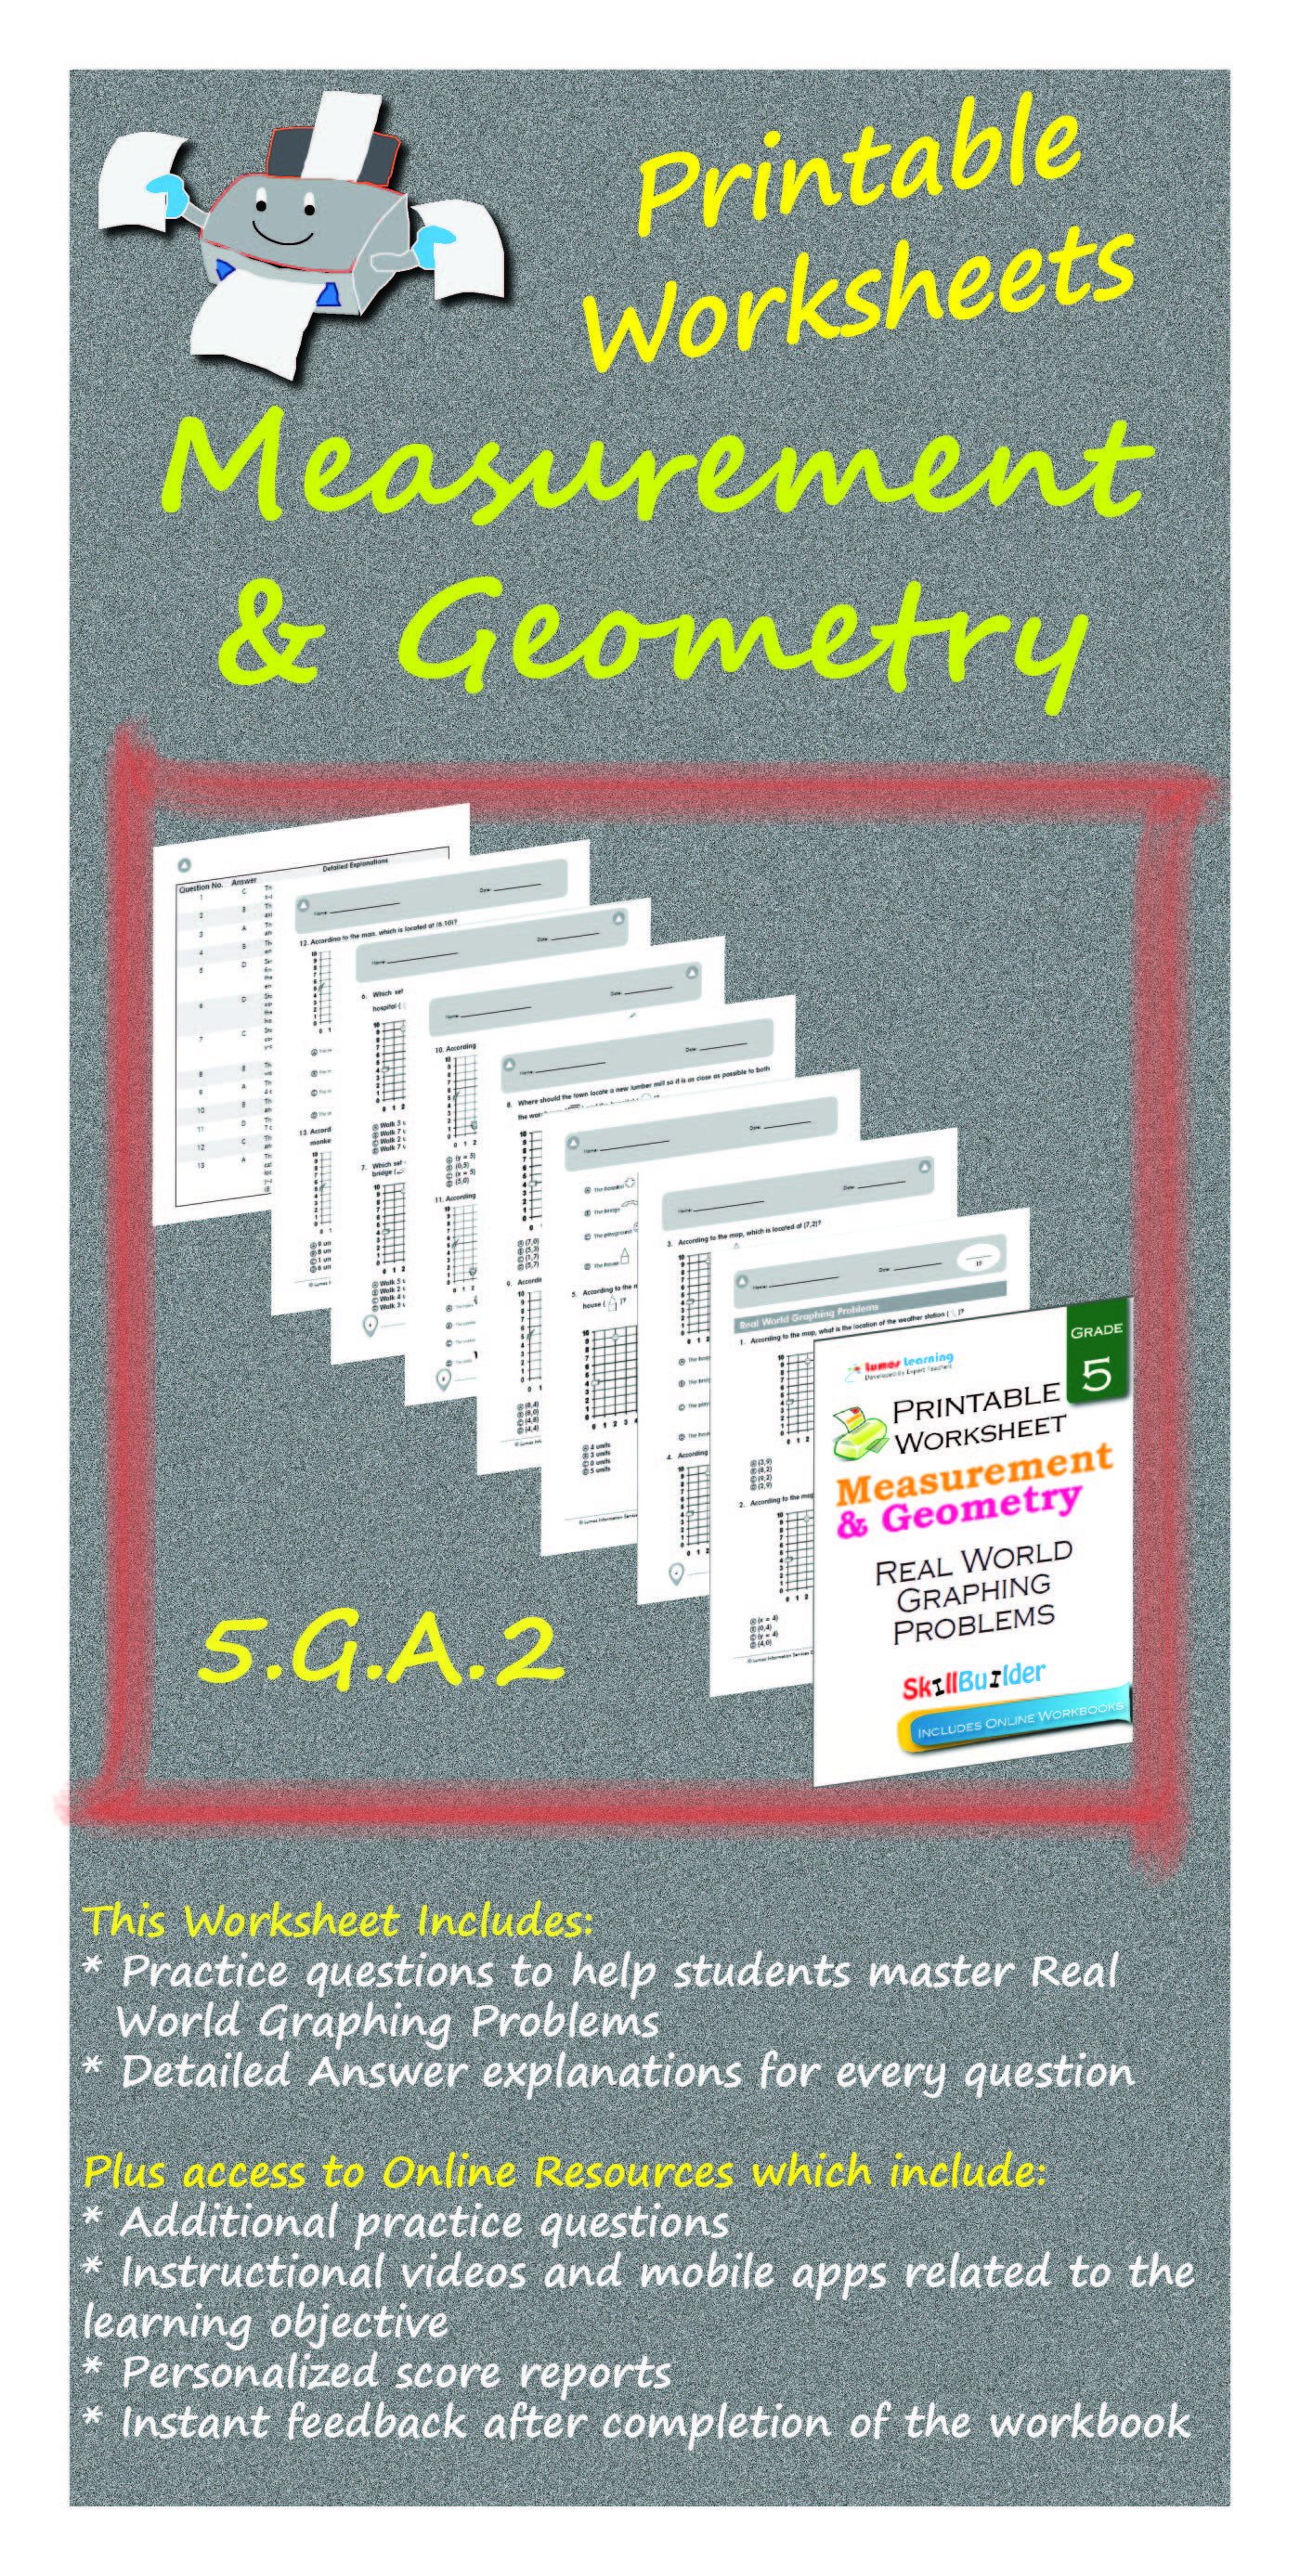 Grade 5 Math Printable Worksheet 5 G A 2 Measurement And Geometry Math Geometry Worksheets Printable Worksheets Grade 5 Math Worksheets Math Printables [ 2775 x 1400 Pixel ]